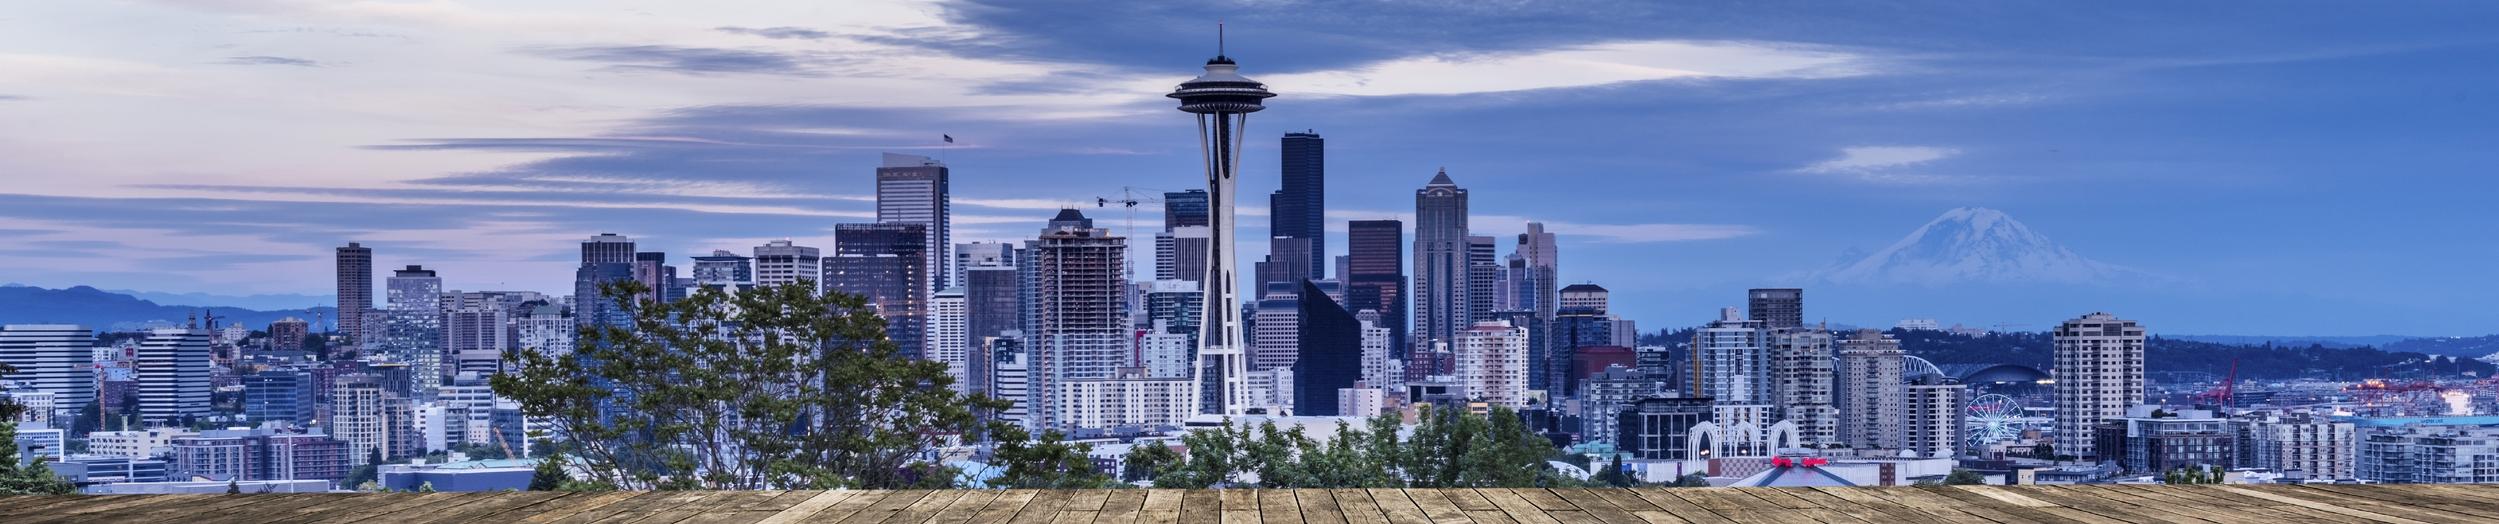 Top 10 Seattle Marketing Agencies